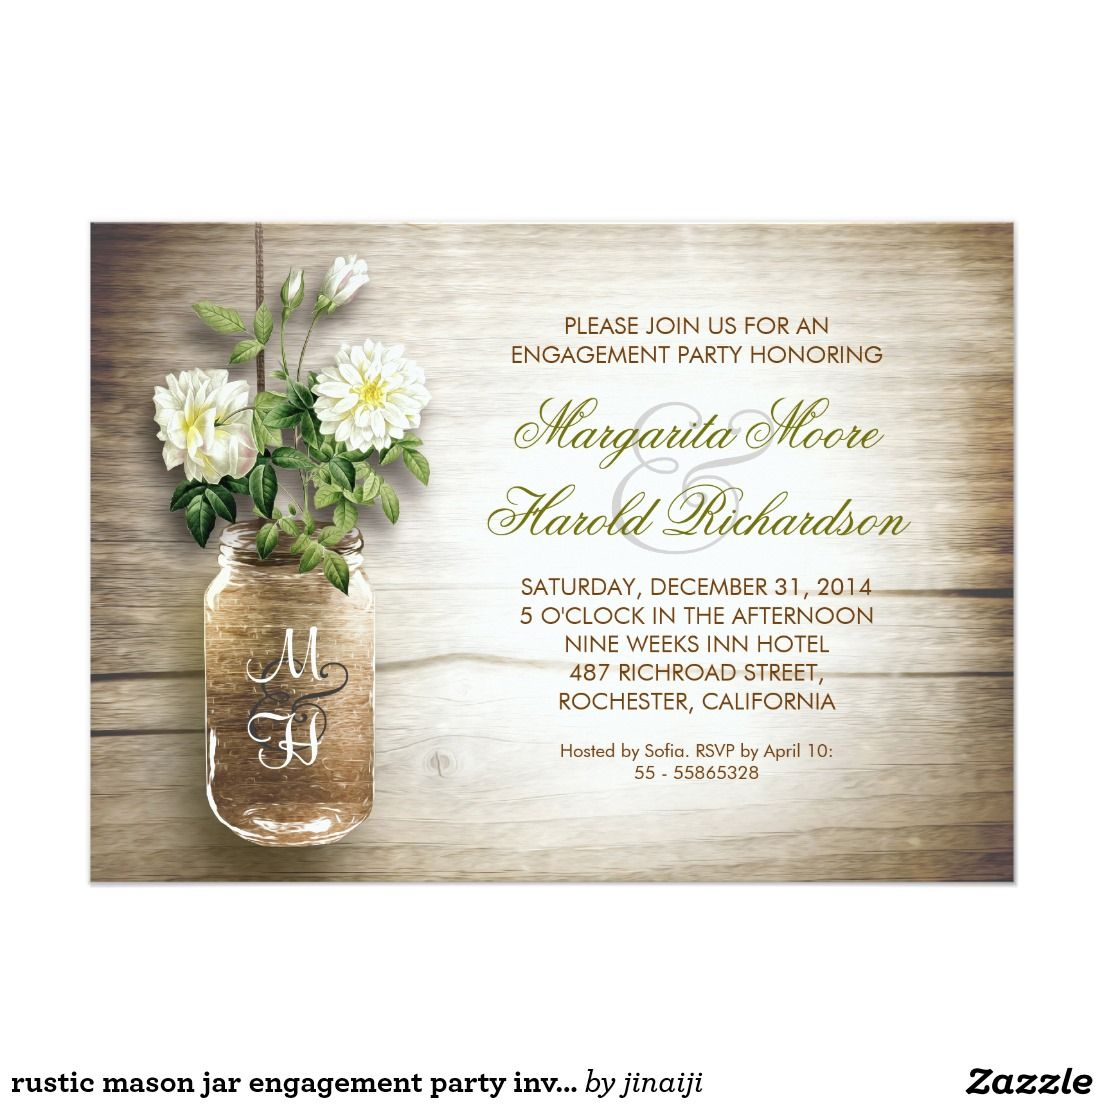 rustic mason jar engagement party invitations | Wedding :Engagement ...